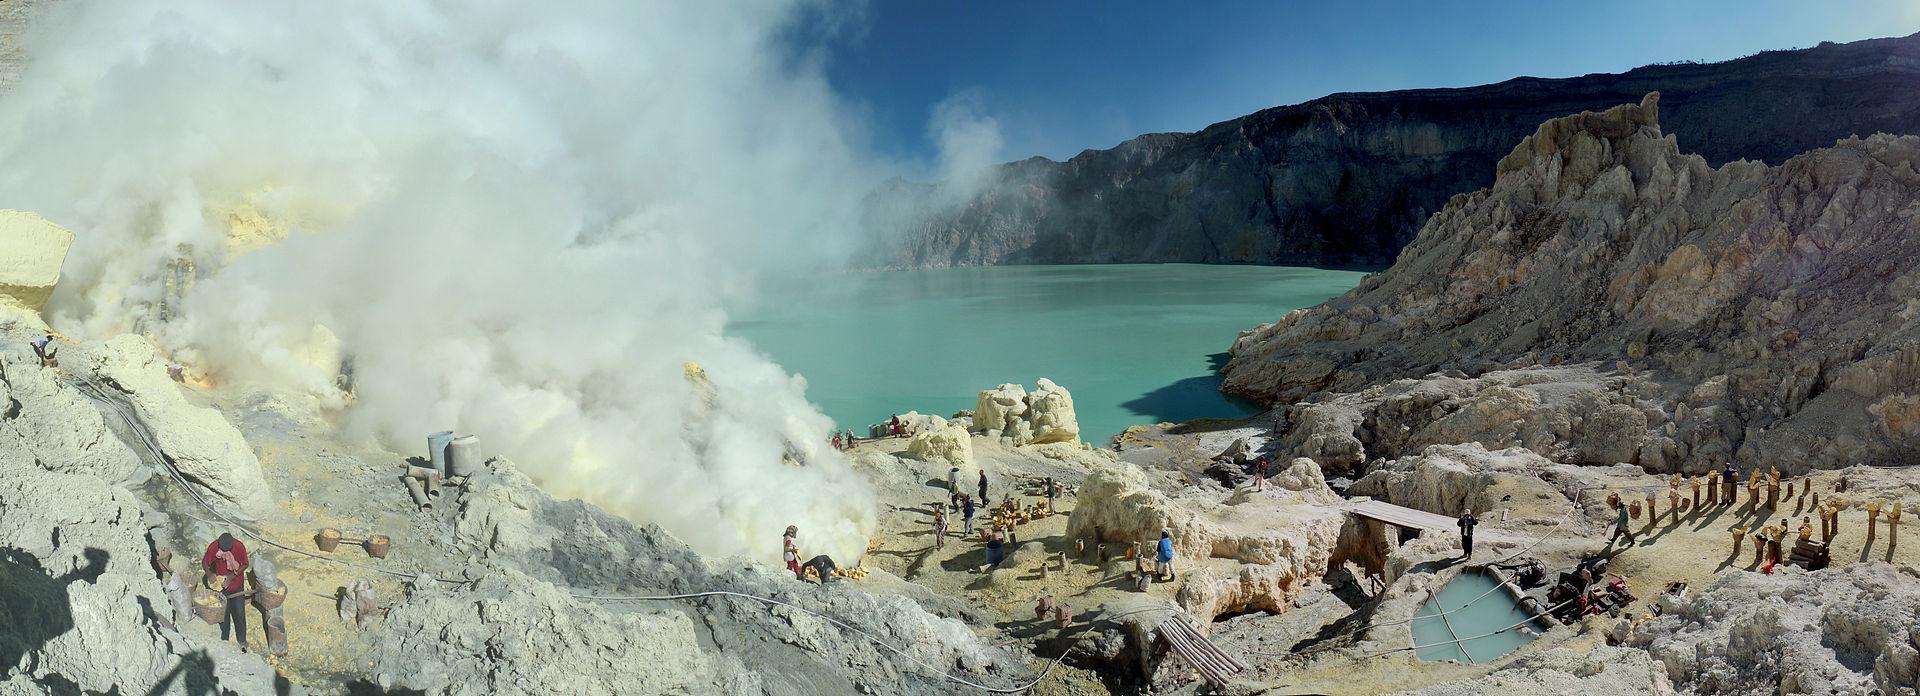 Sulfur_mining_in_Kawah_Ijen_-_Indonesia_-_20110608.jpg